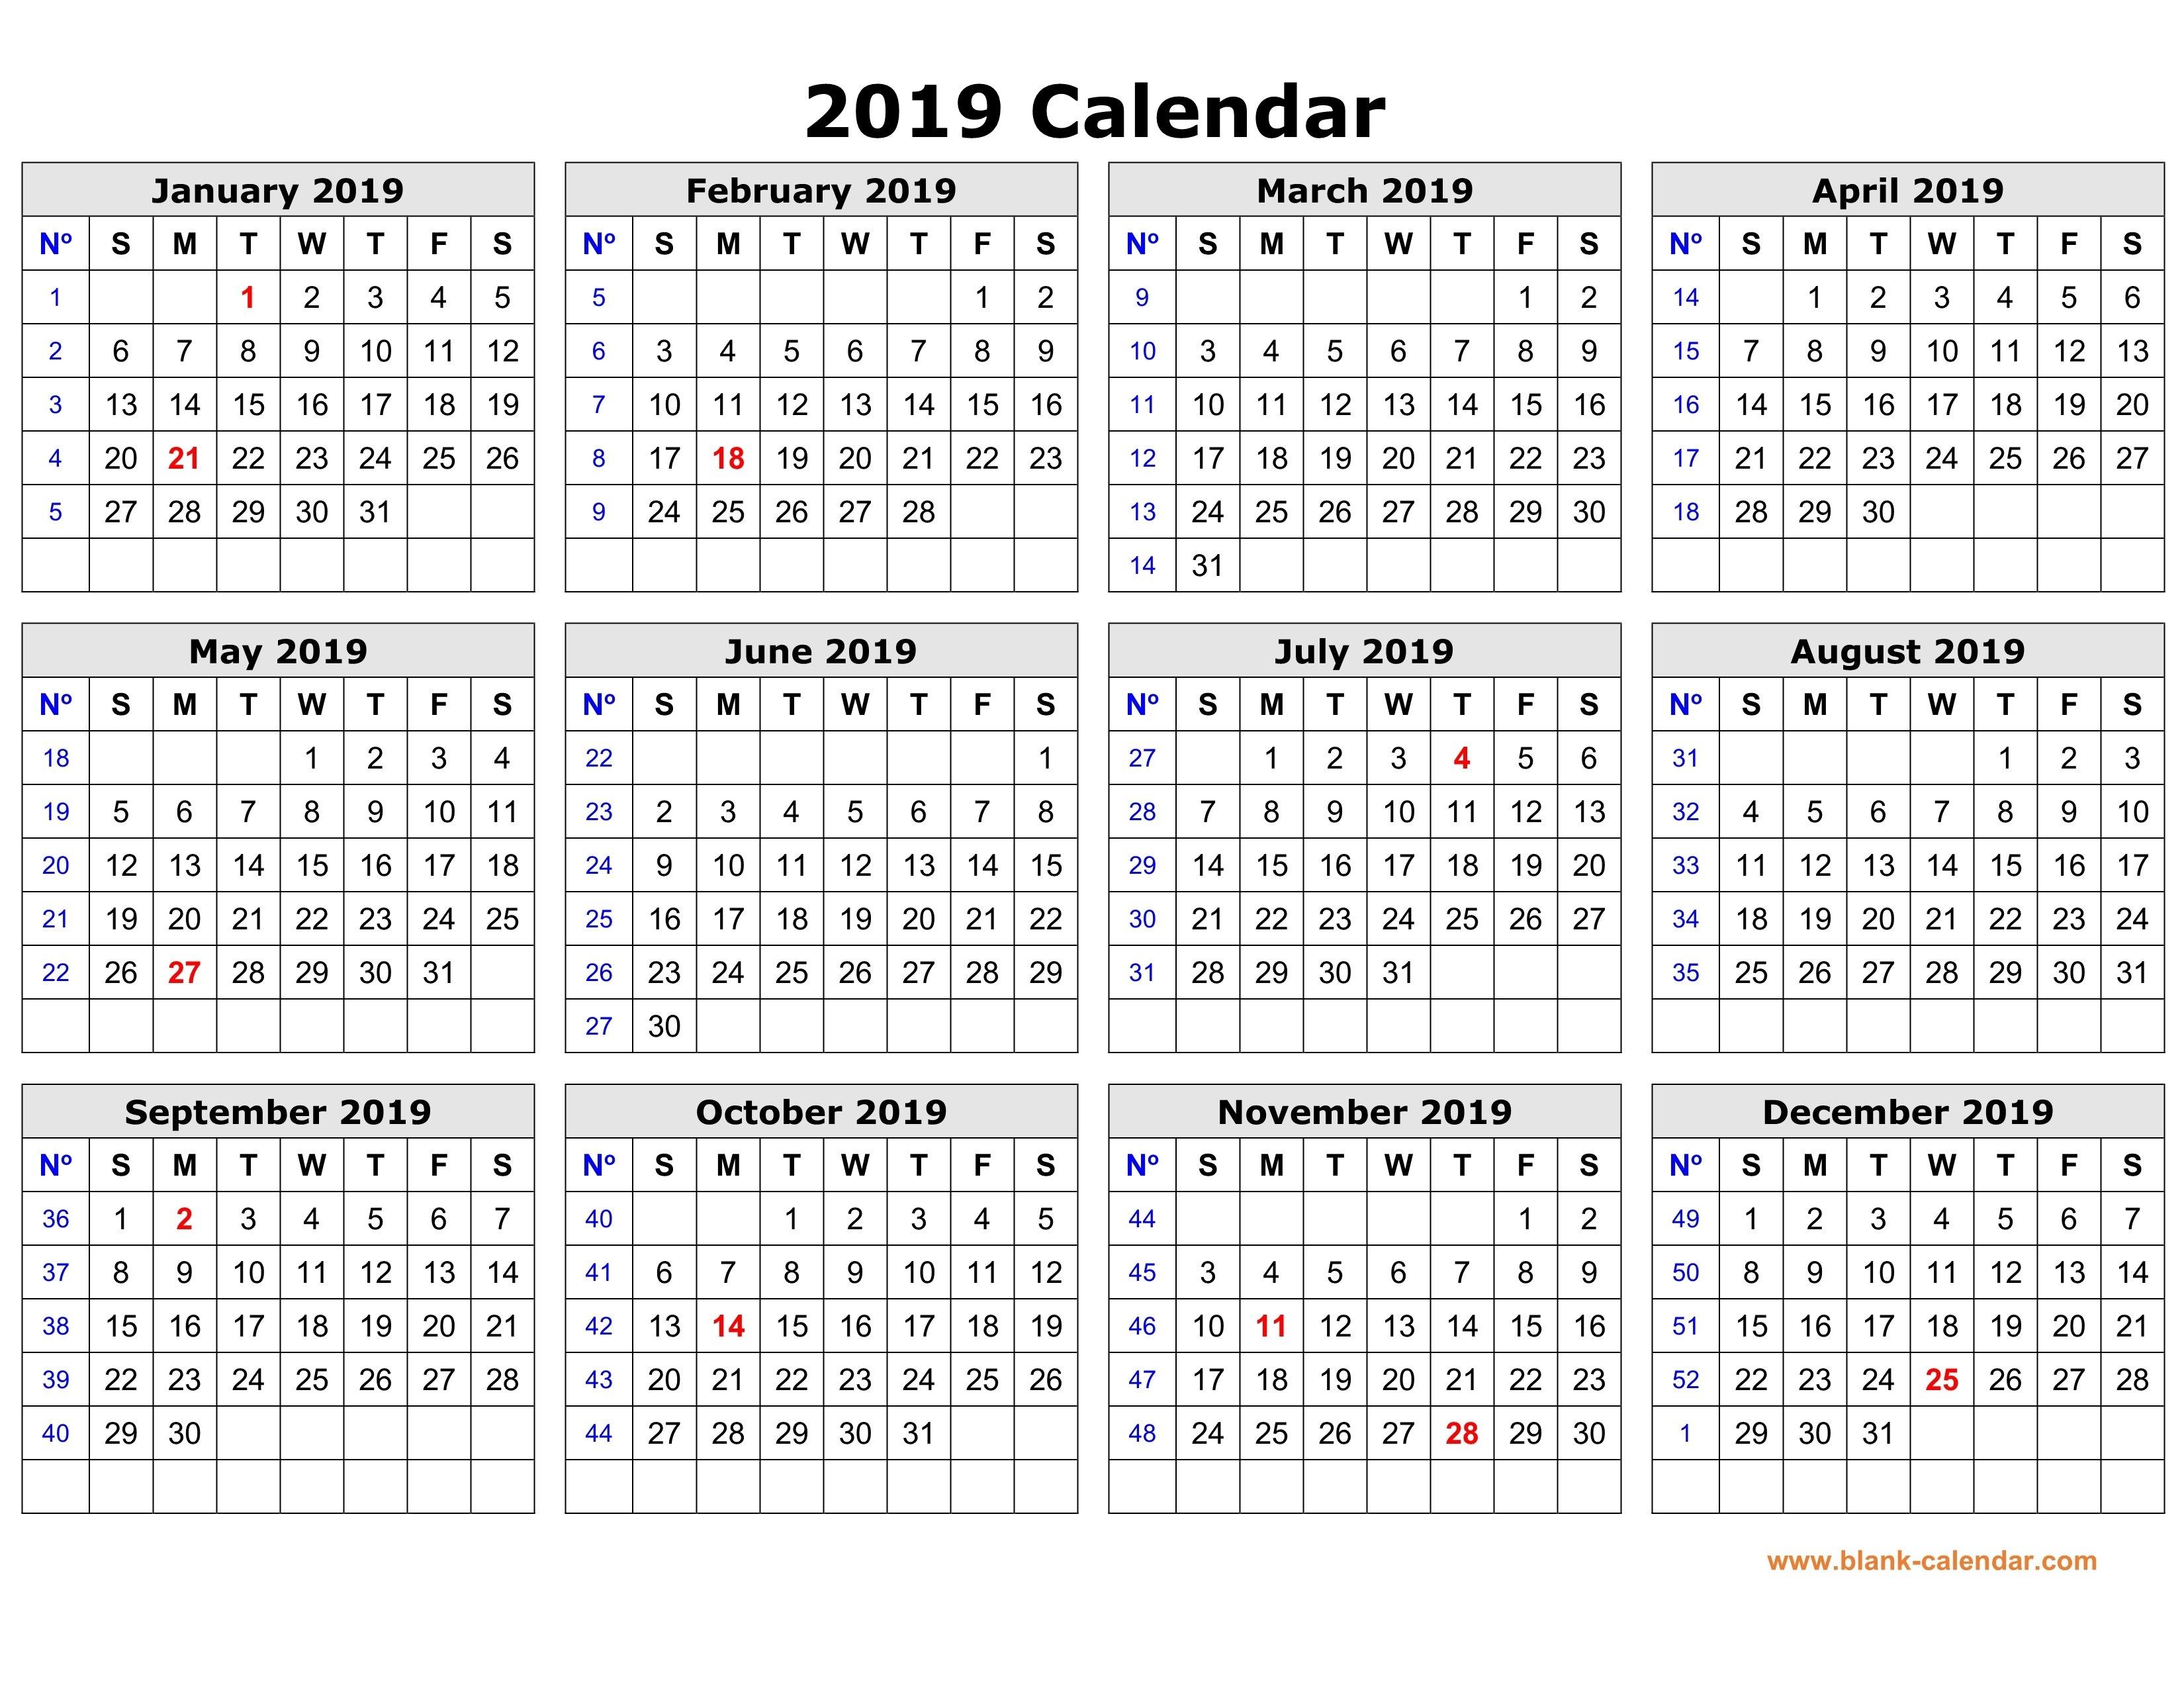 Free Download Printable Calendar 2019 In One Page, Clean Design. Calendar 2019 Printable Free